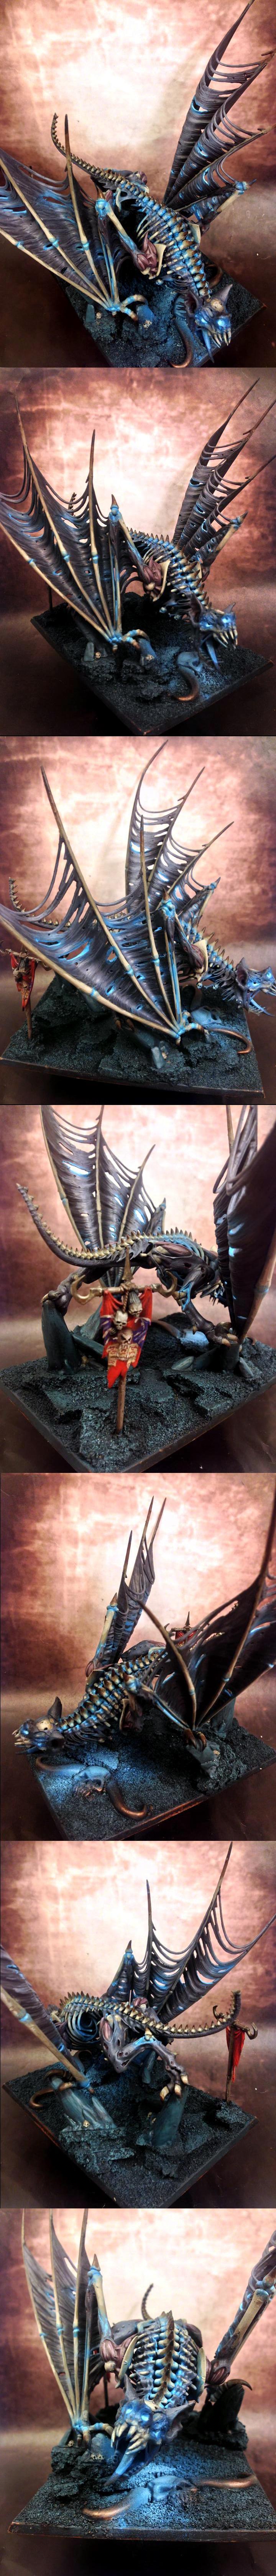 Aosol, Terrogheist, Vampire Counts, Warhammer Fantasy